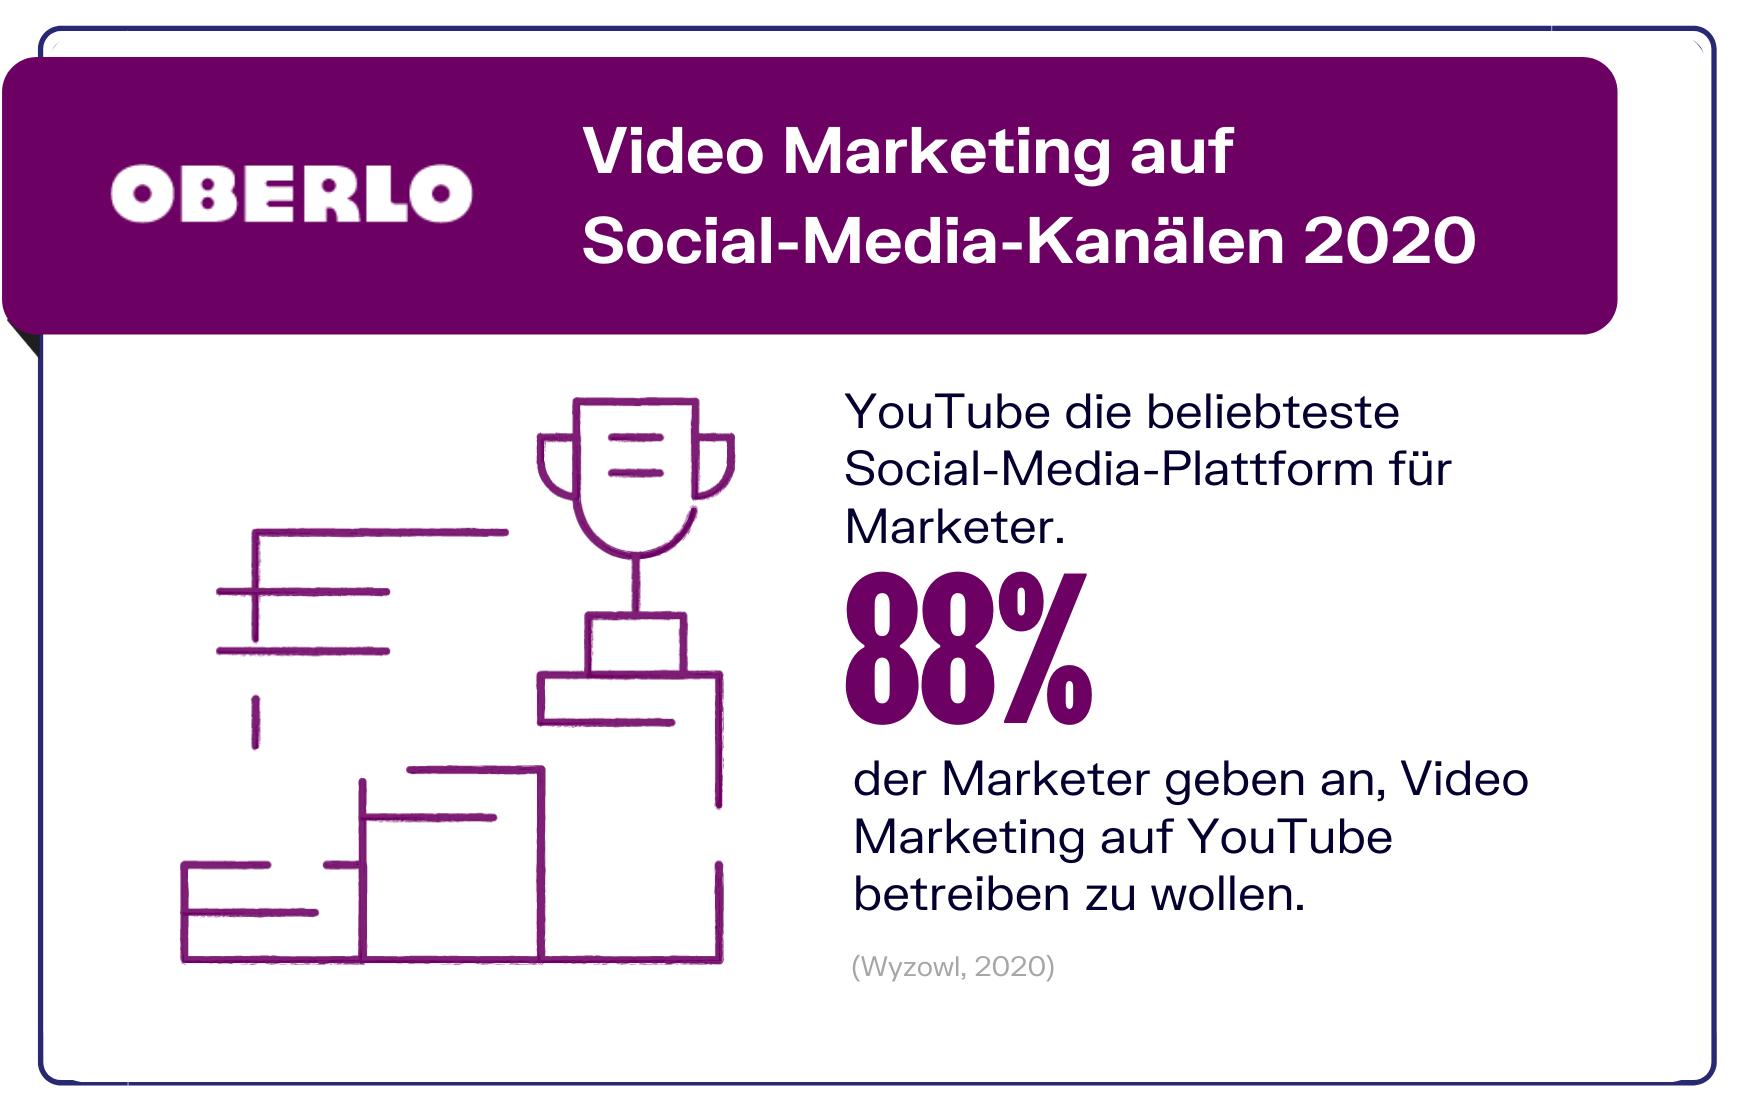 Video Marketing in den sozialen Medien